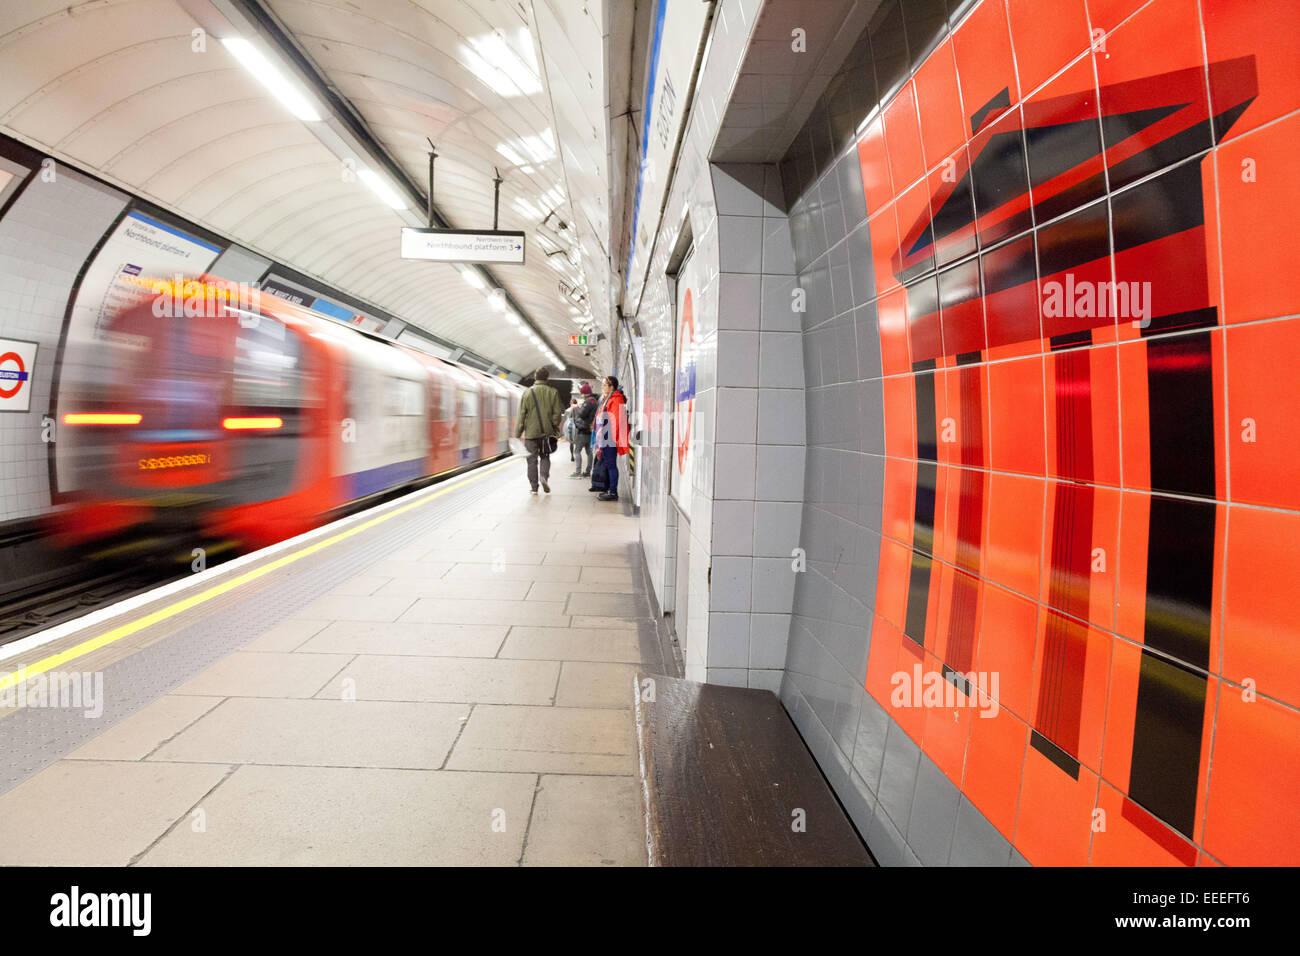 Victoria line platforms at Euston - Stock Image